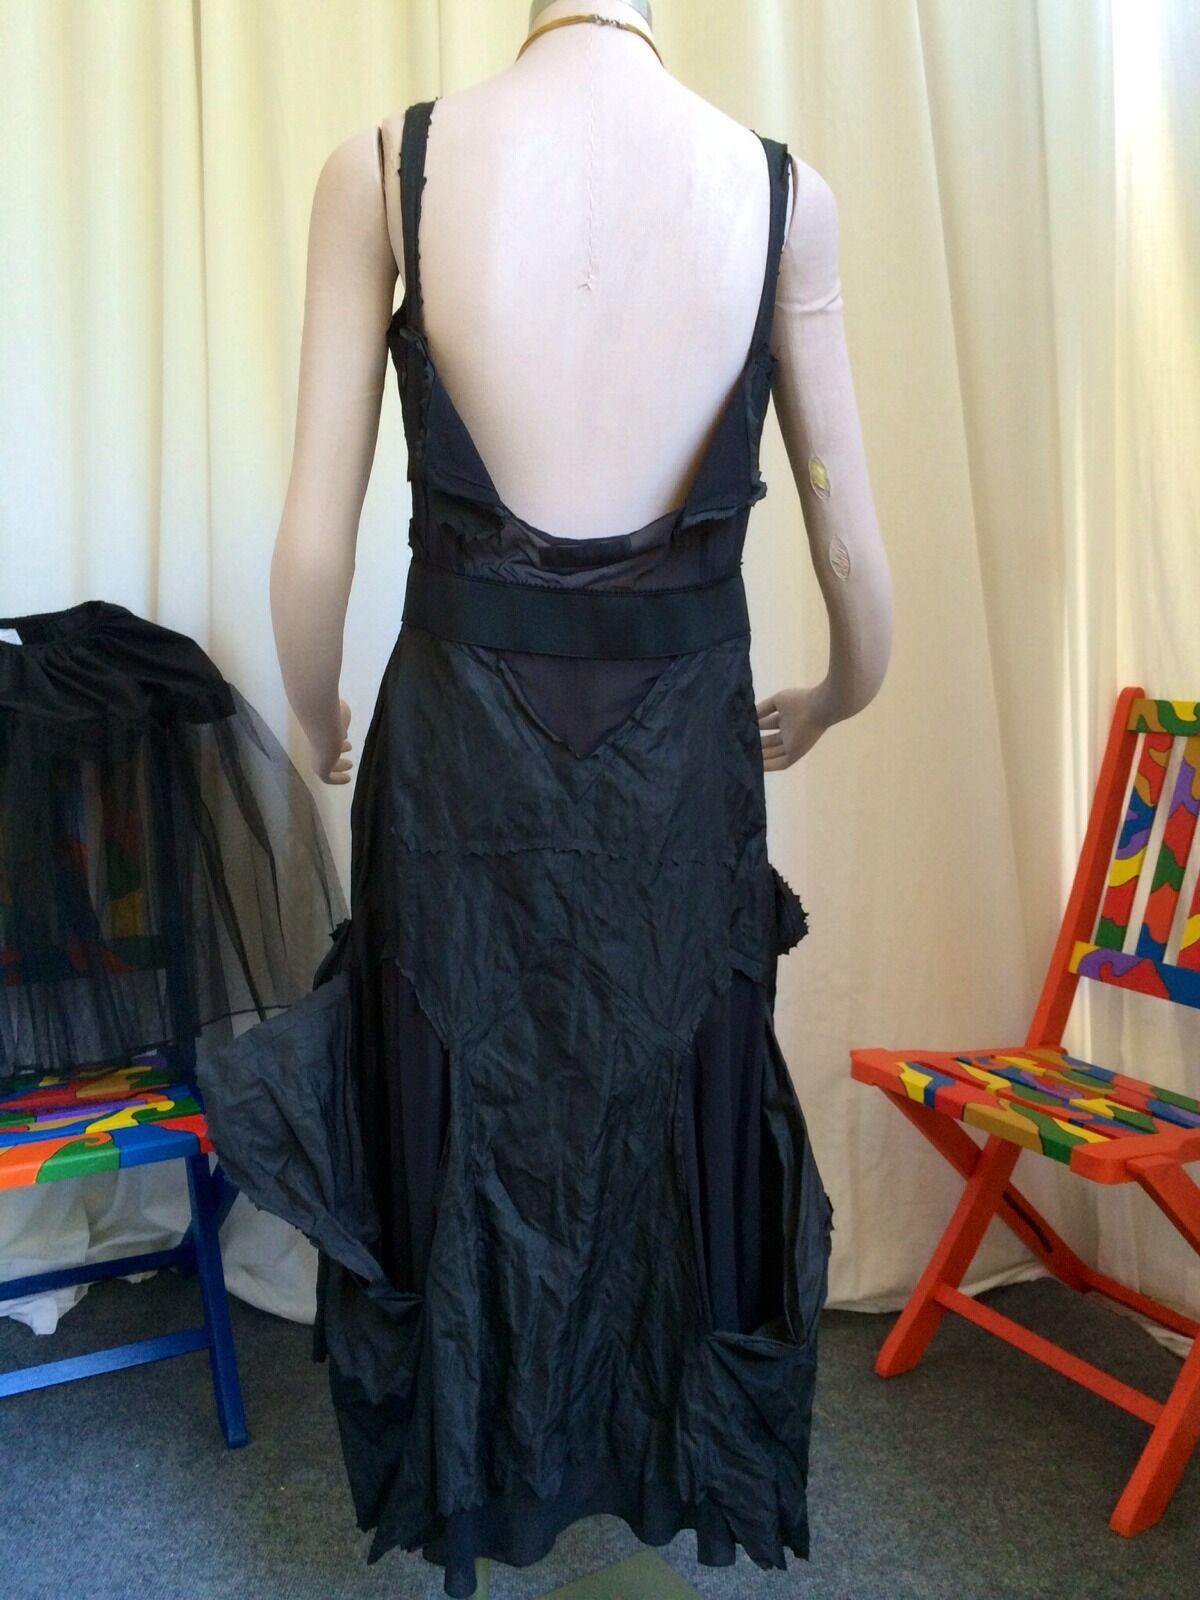 CHRISTIAN DIOR DRESS DRESS DRESS RARE LAGENLOOK ASYMMETRIC RIPPED CUT-OUT MESH INSERTS  12 e49aa5